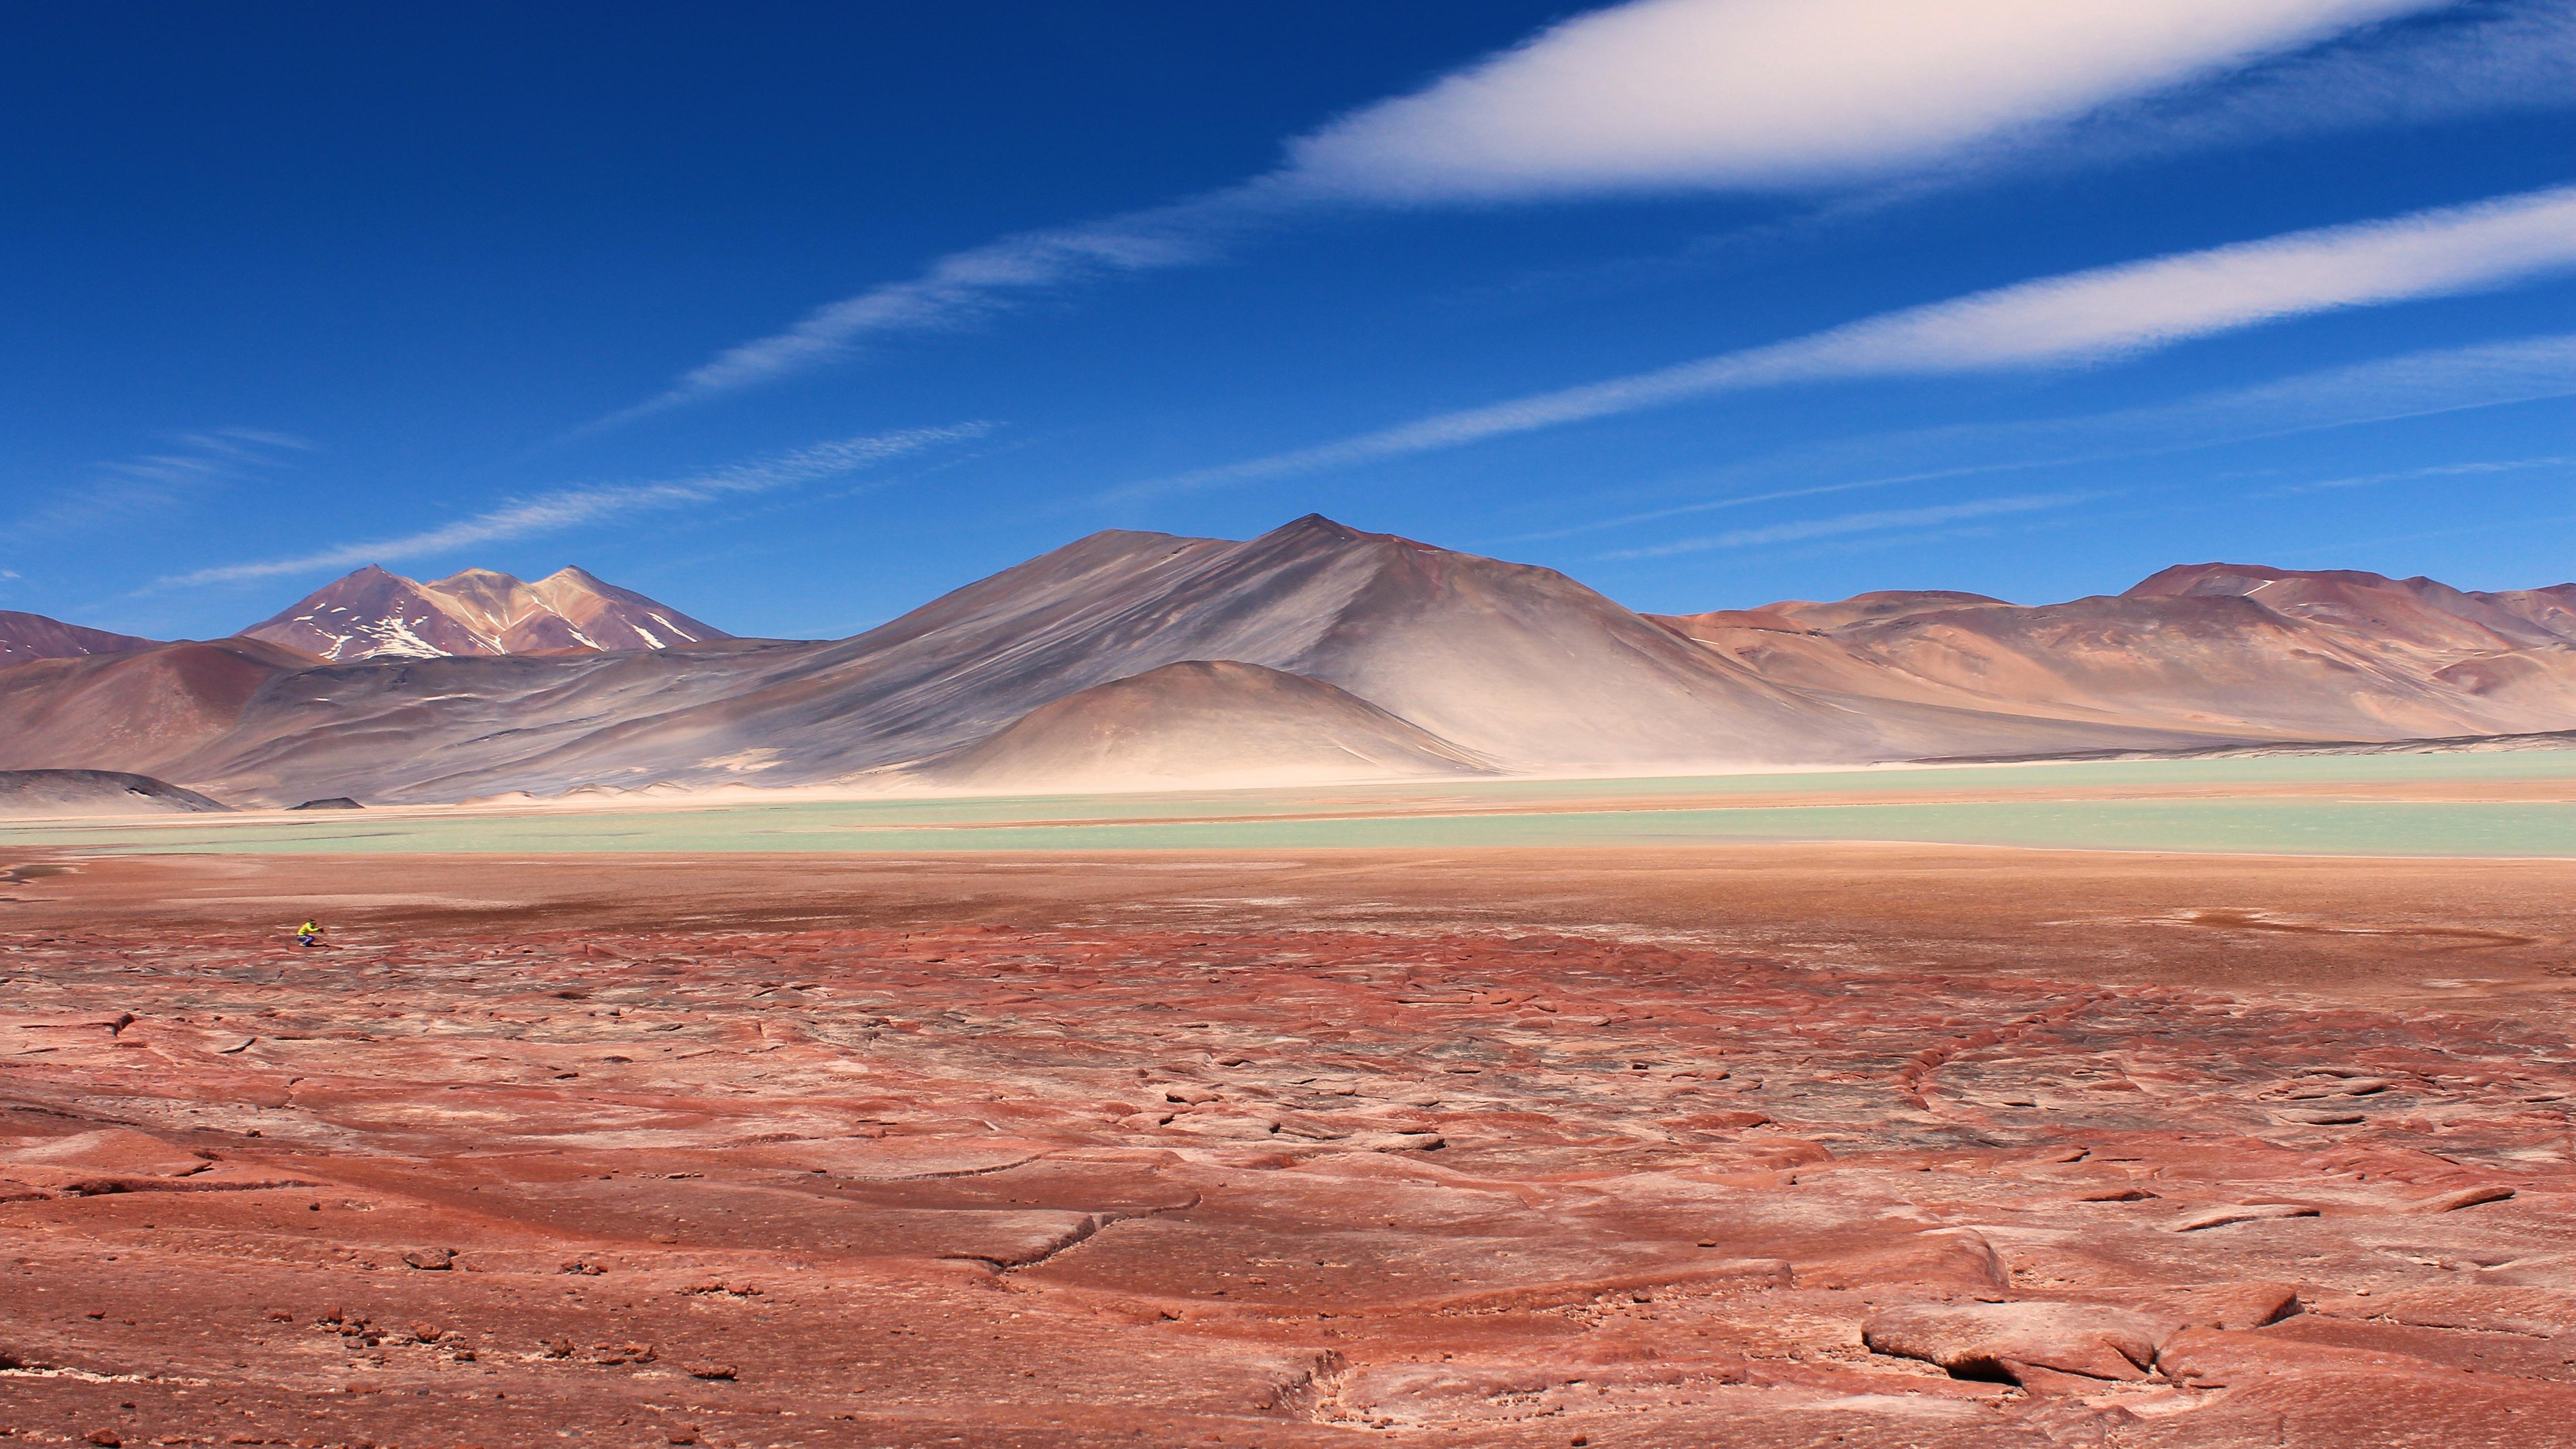 5120x2880 desert landscape sky mountain travel nature 5k hd 4k